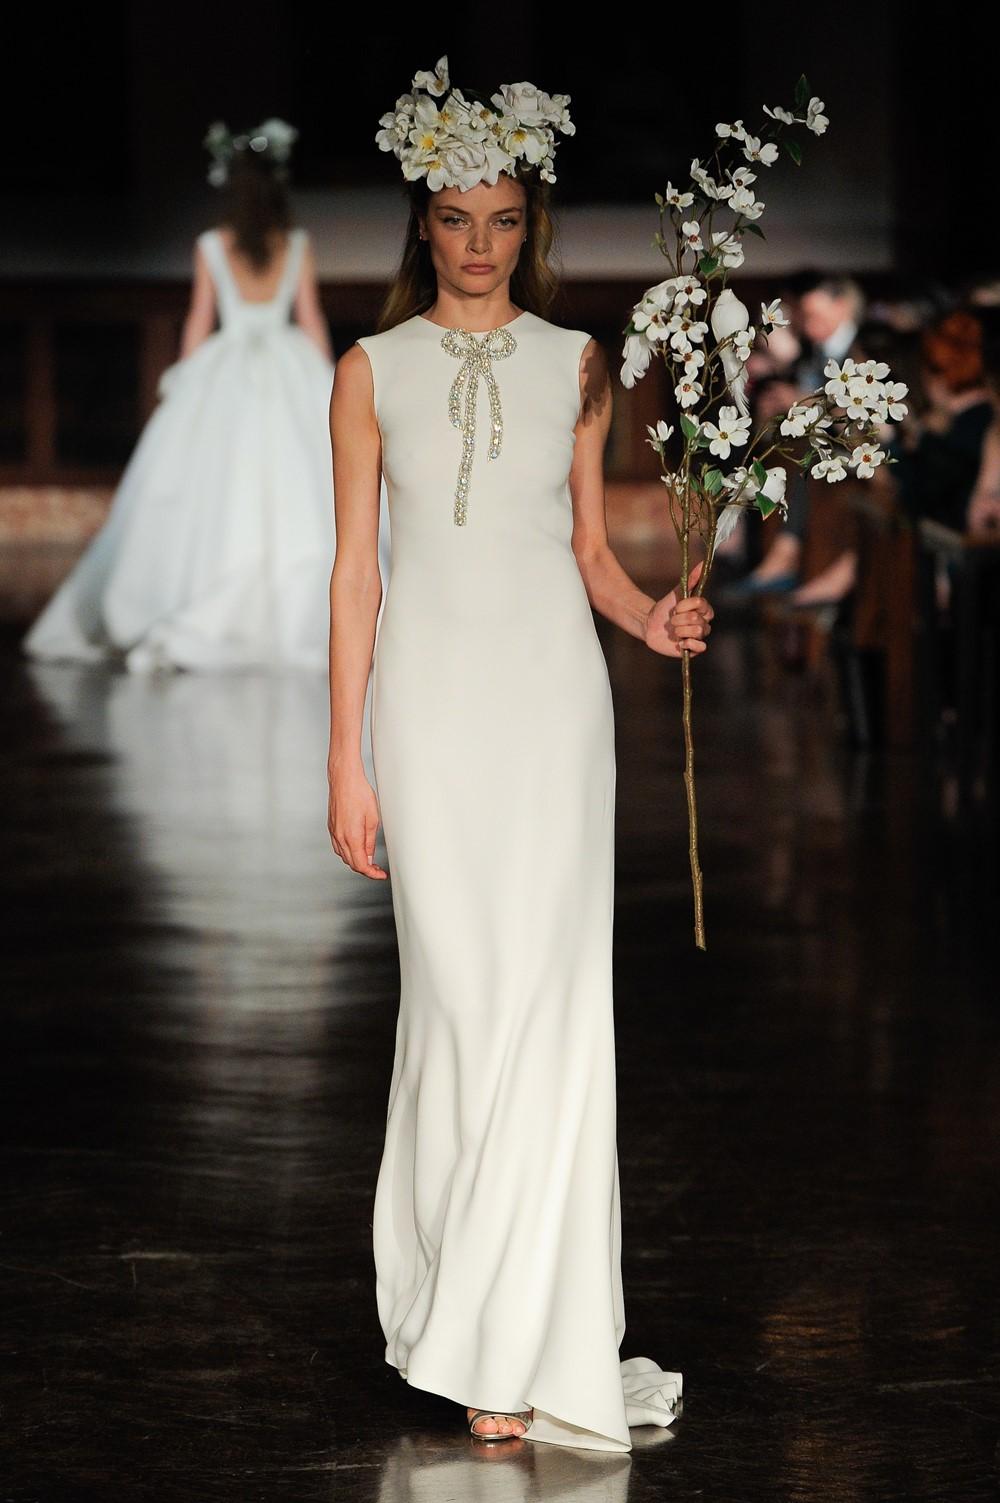 Bridal Trend for 2019 Bows - Reem Acra Wedding Dress